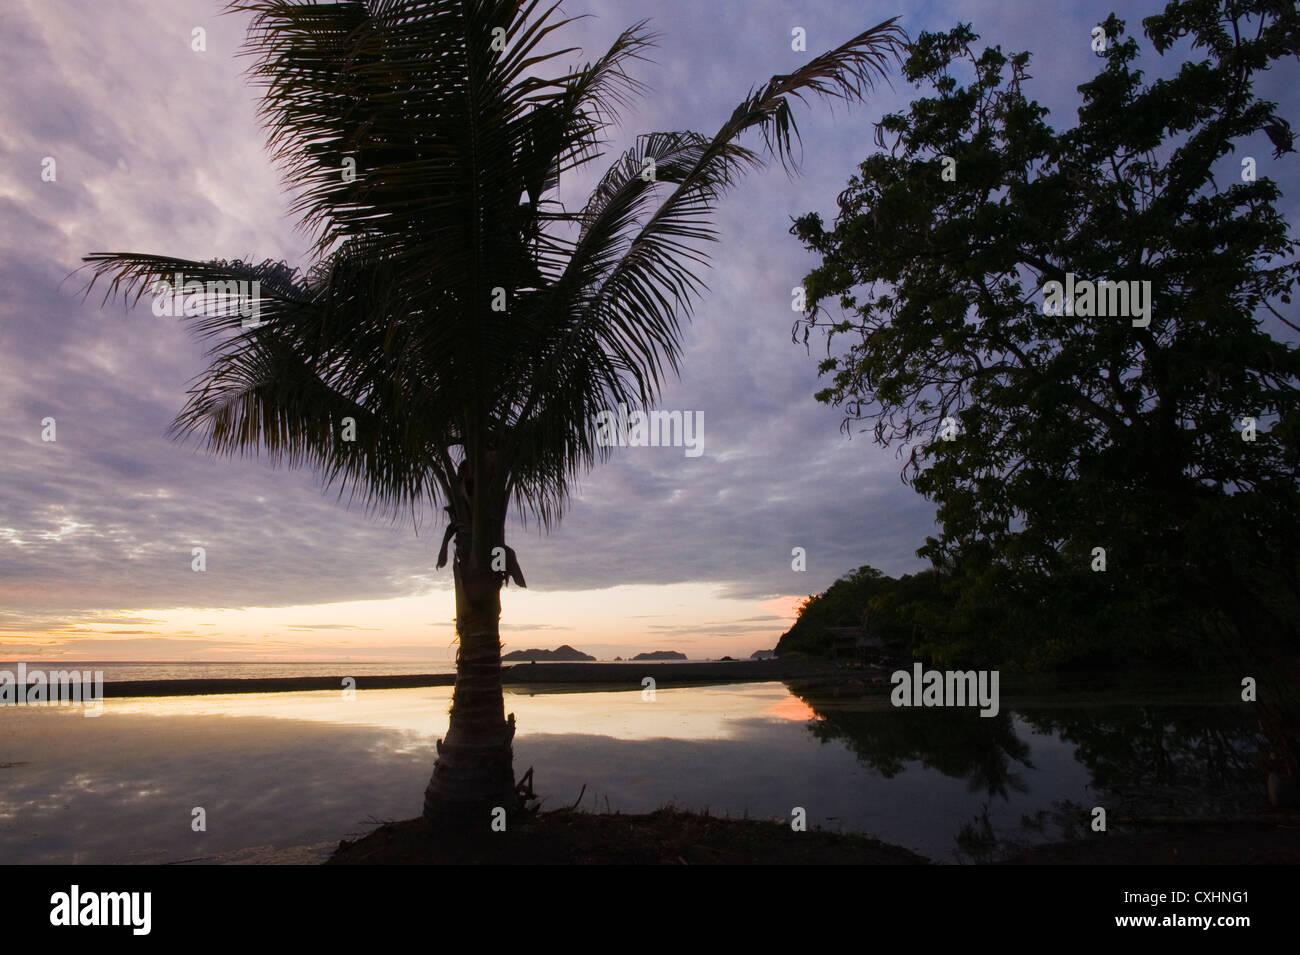 Teku Lagoon and Ocean, Tompotika Peninsula, Central Sulawesi, Indonesia, dawn - Stock Image